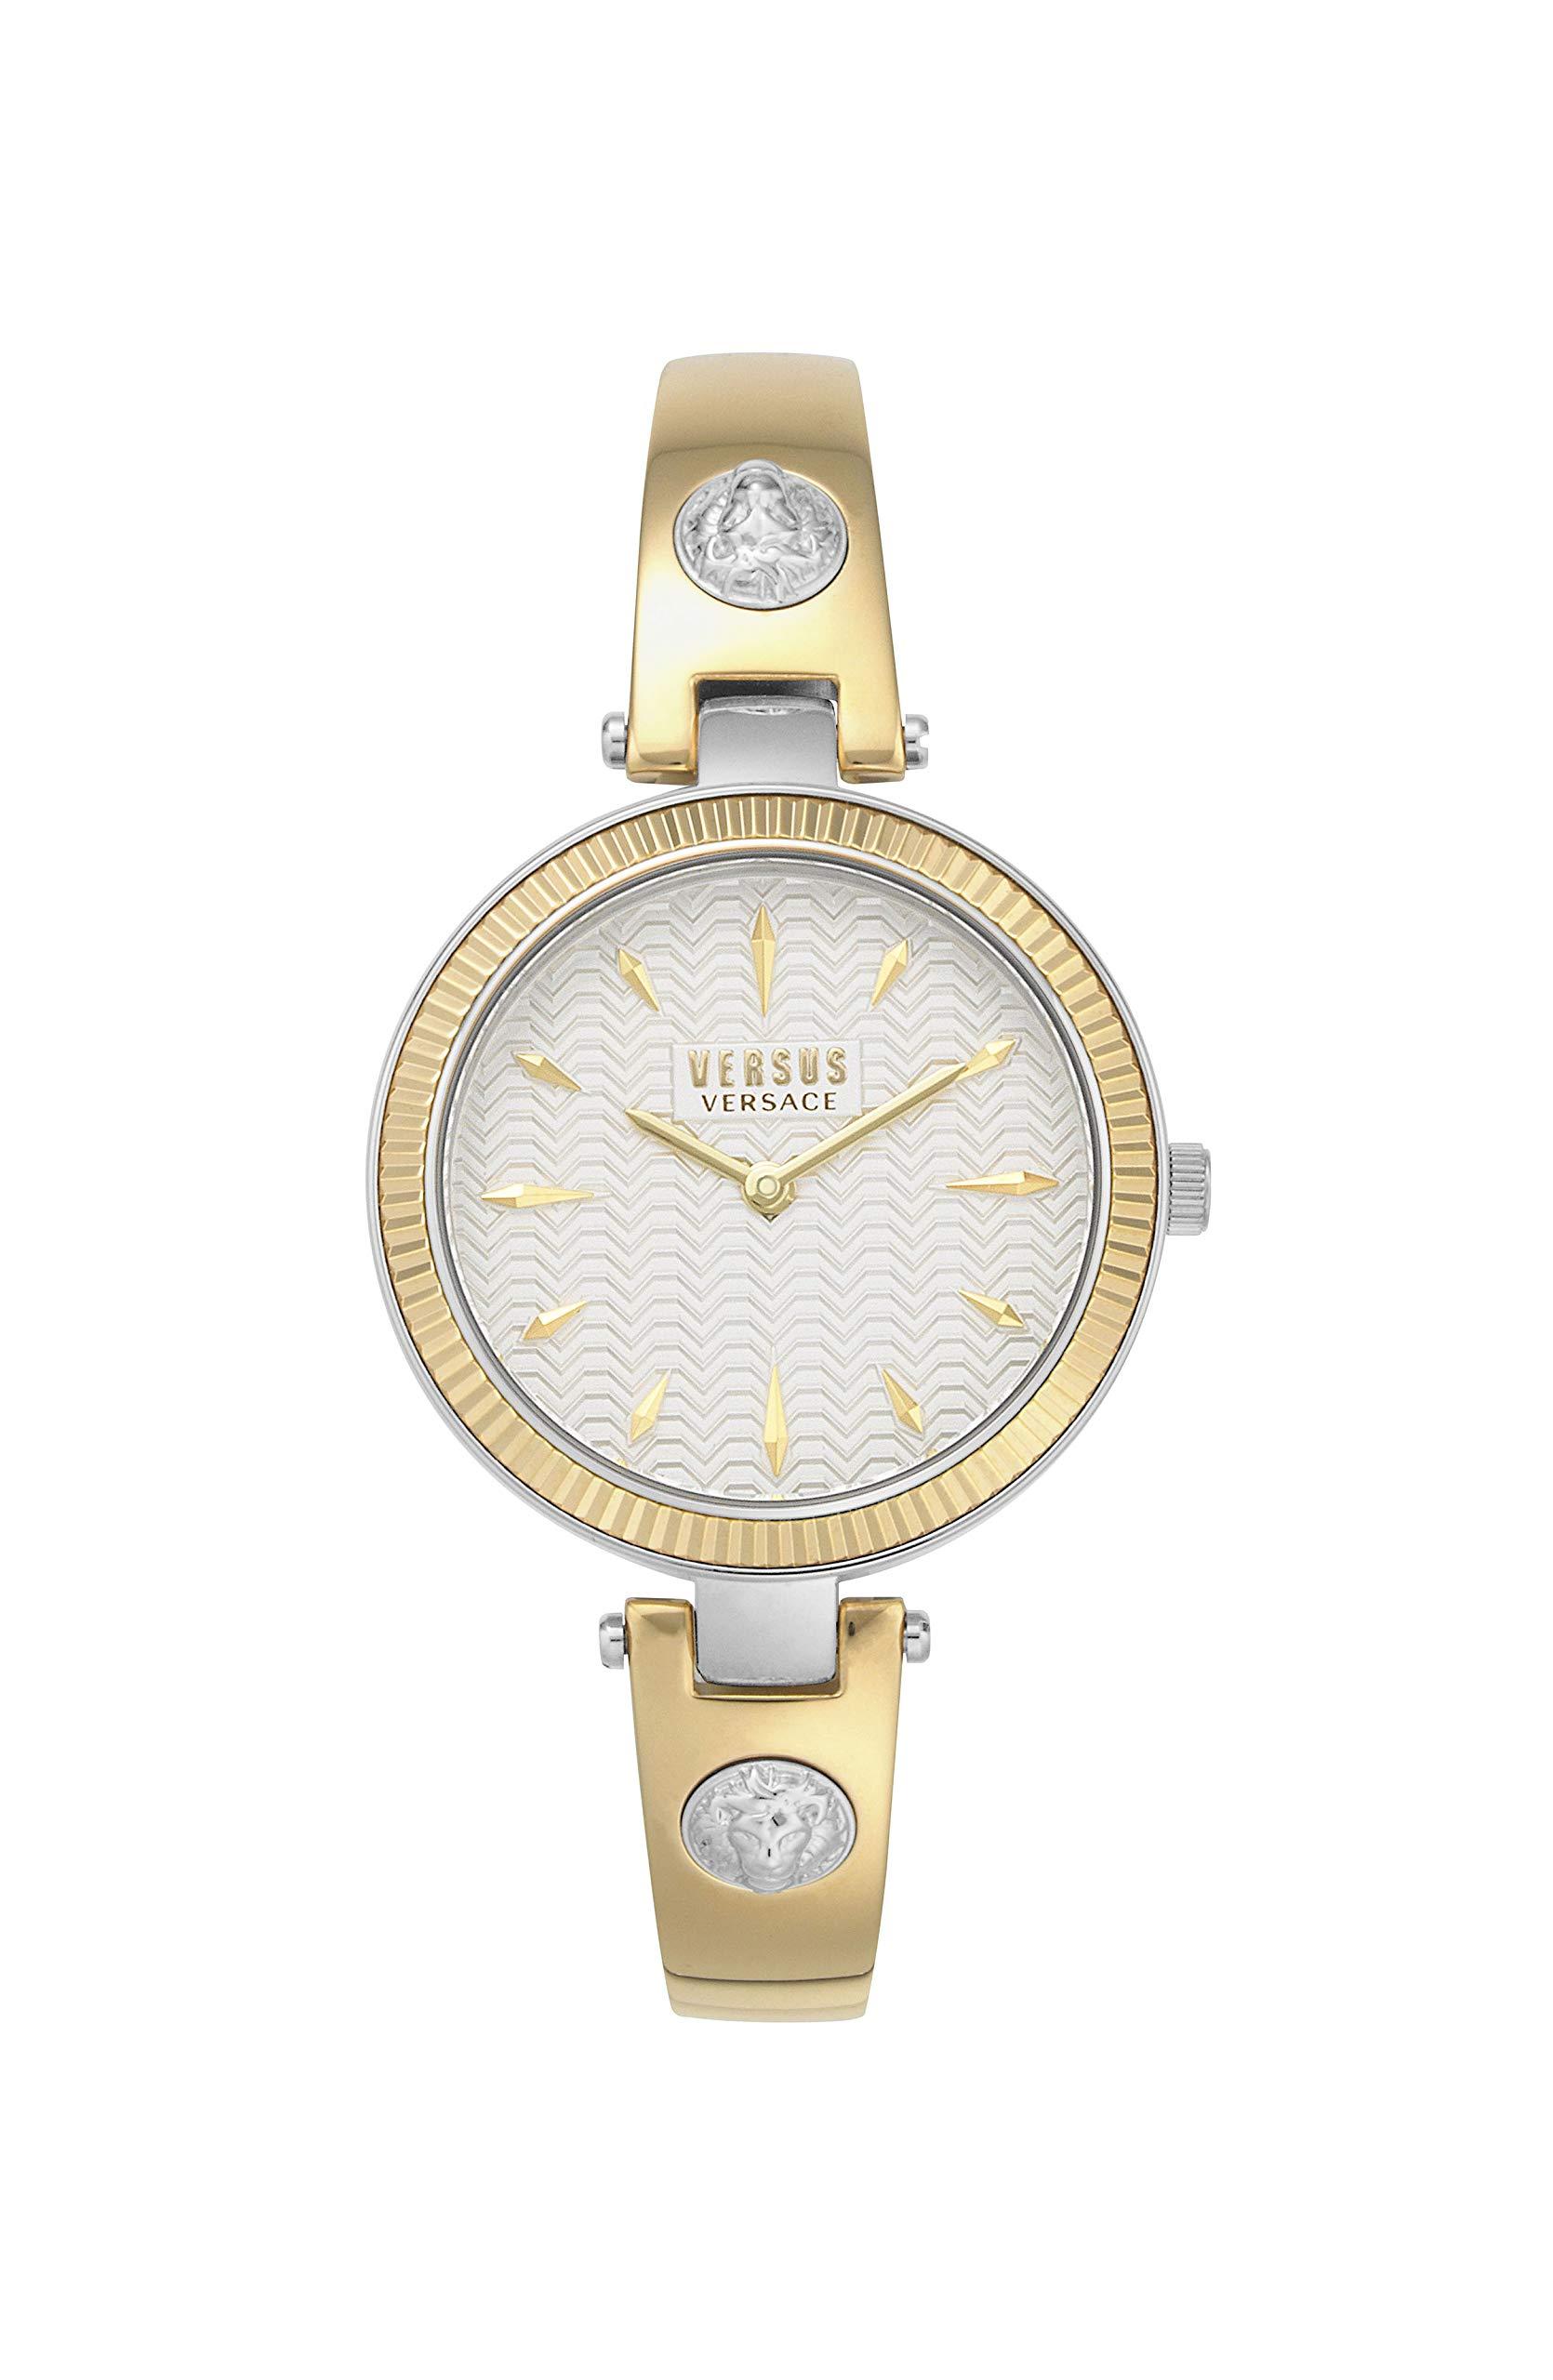 Versus by Versace Women's Brigitte Quartz Gold-Plated-Stainless-Steel Strap, 11.5 Casual Watch (Model: VSPEP0219) by Versus by Versace